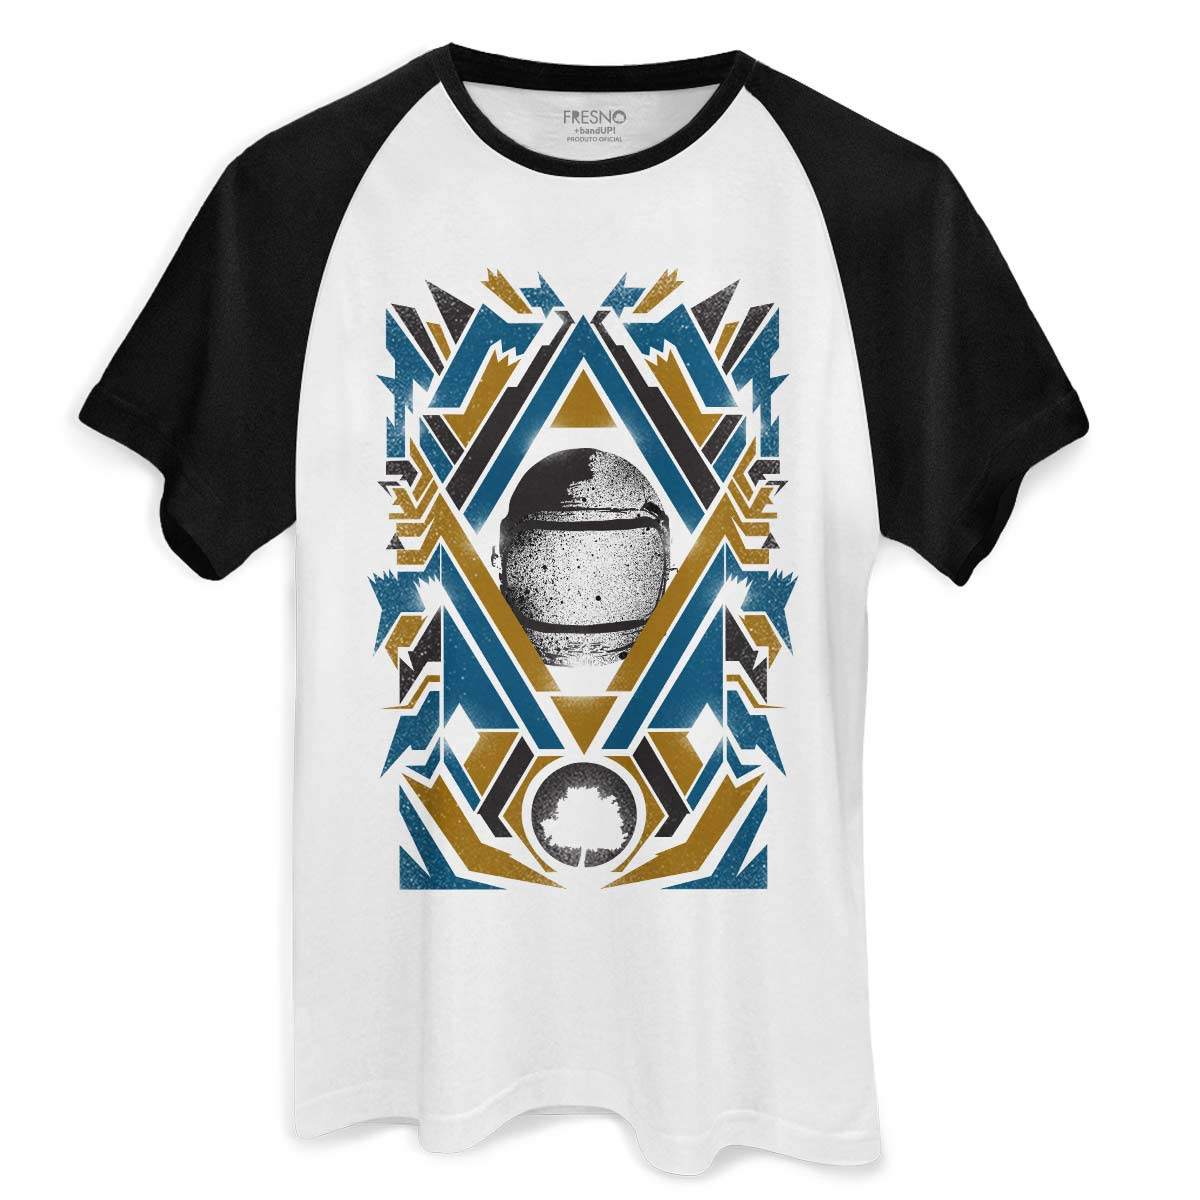 Camiseta Raglan Masculina Fresno Astronaut